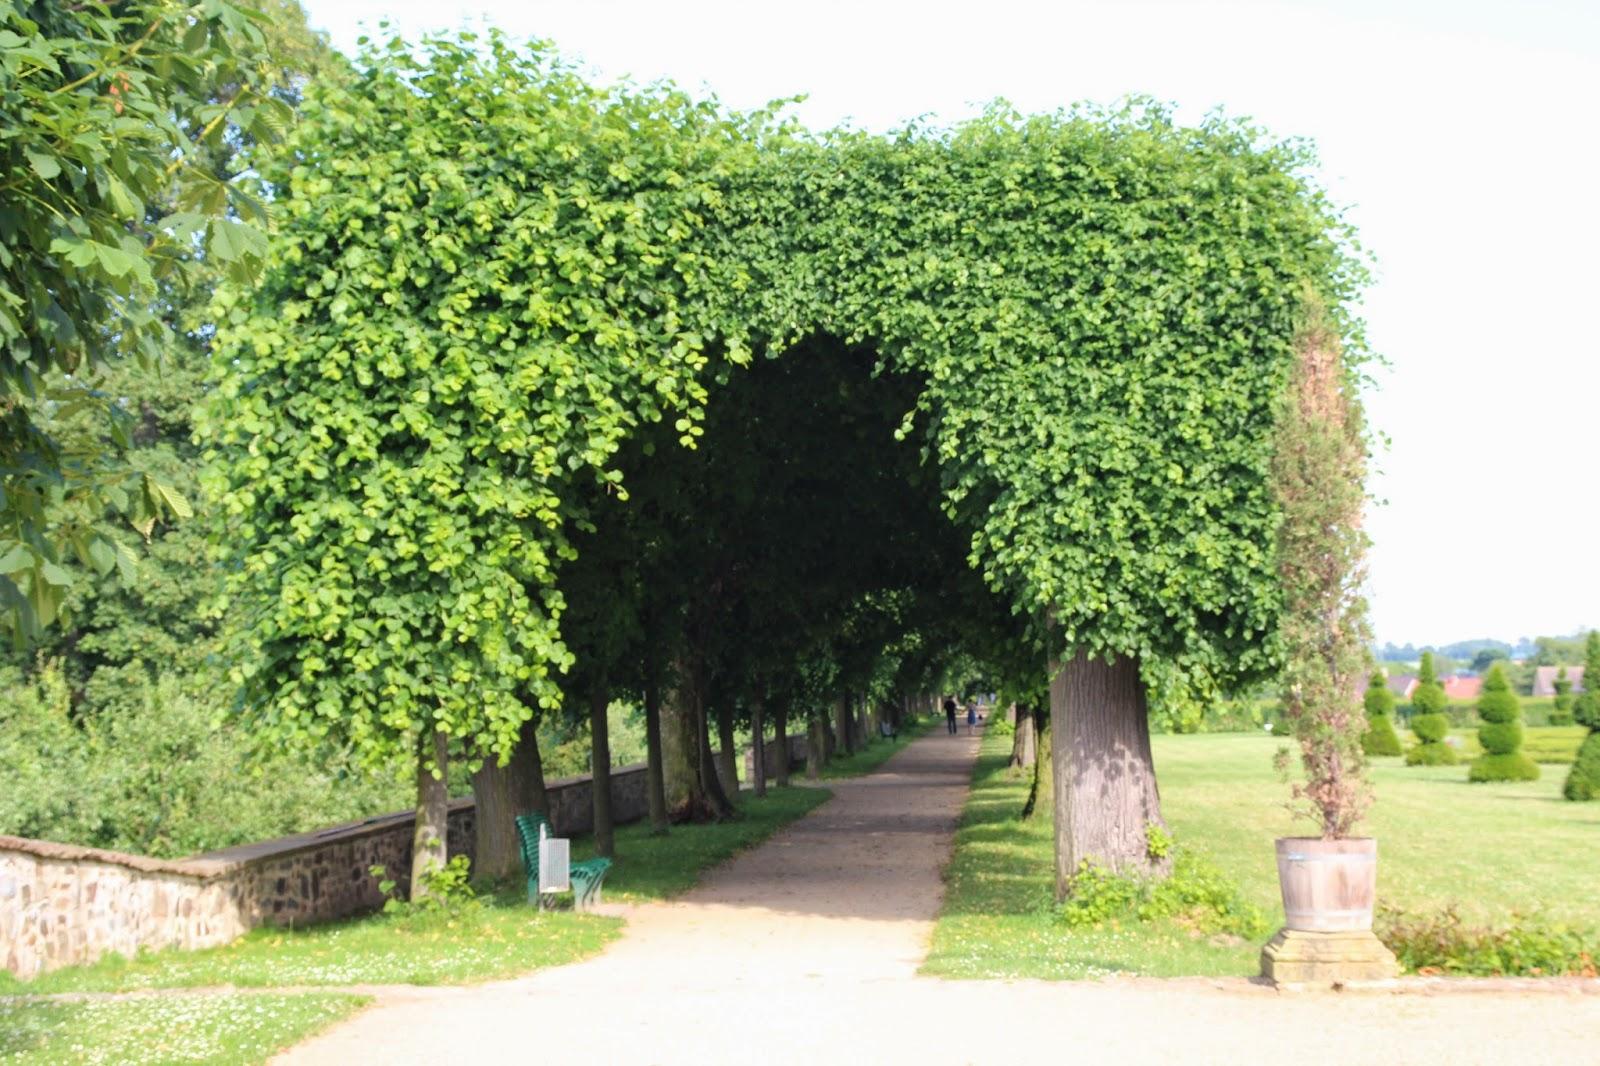 alejka drzewa